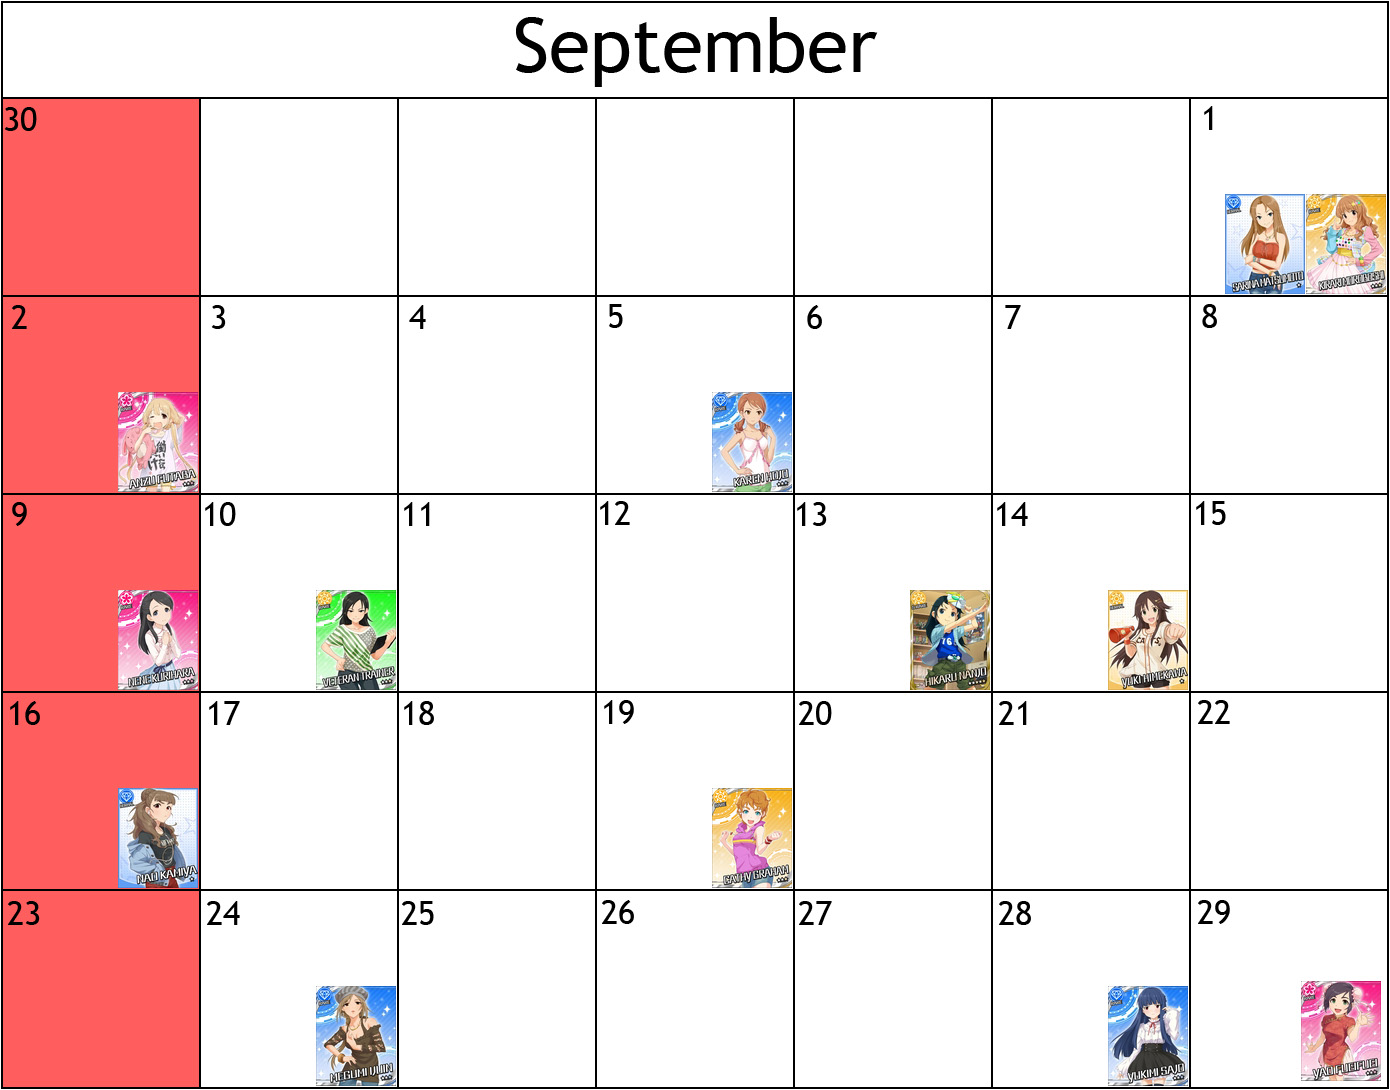 Birthday Calendar Template Word Birthday Calendars 7 Free Printable Word Templates Cinderella Girls Birthday Reminder Calendar The Path Of